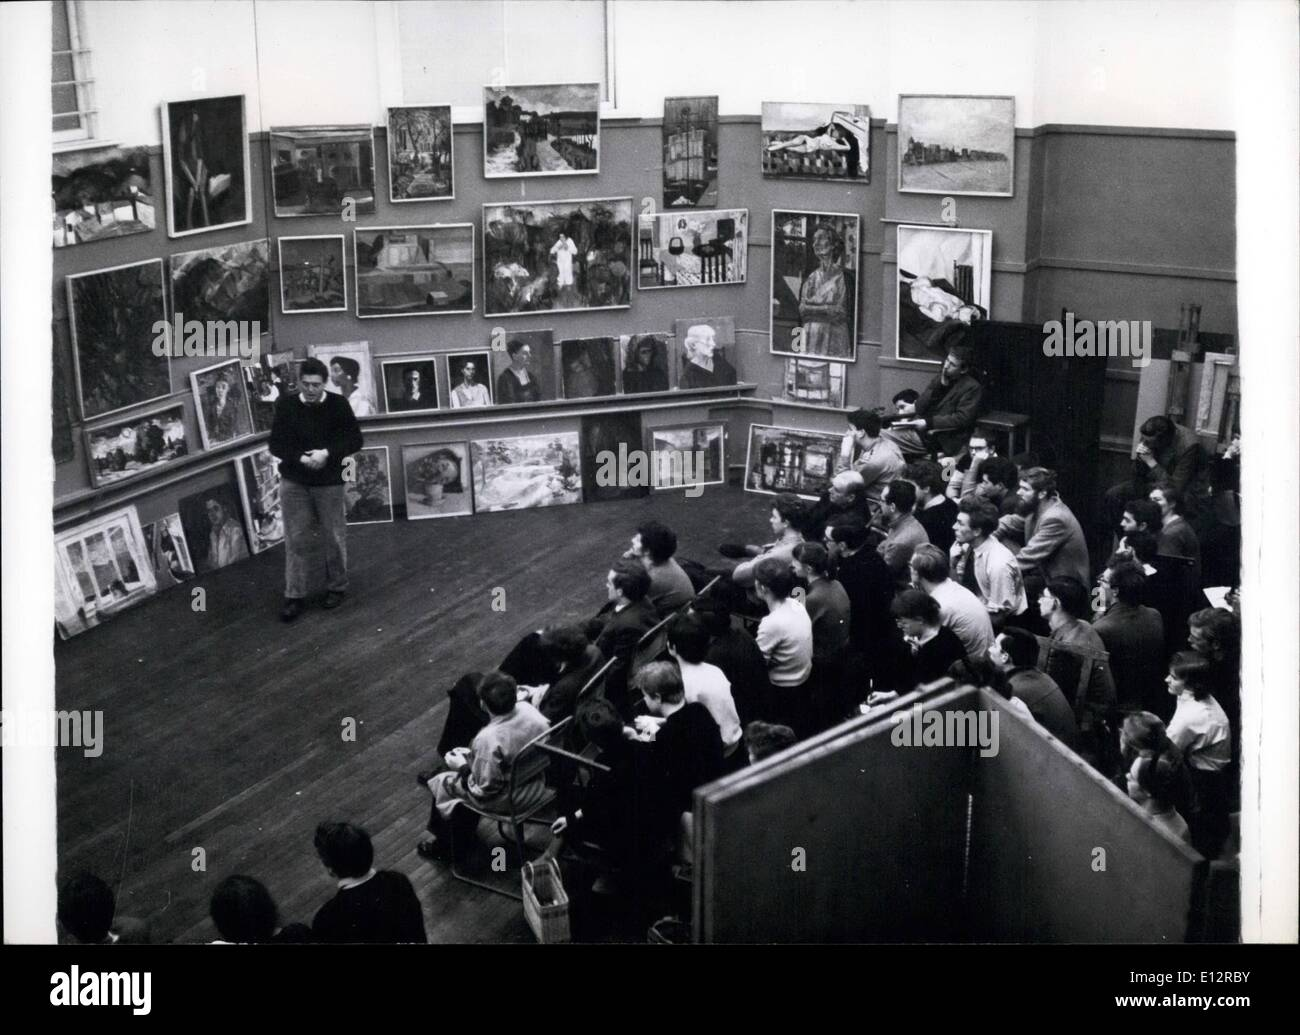 "Febbraio 24, 2012 - La Slade School: Pietro de Francia, un artista, un critising studentââ'¬â""¢s sketch club lavoro. K Immagini Stock"